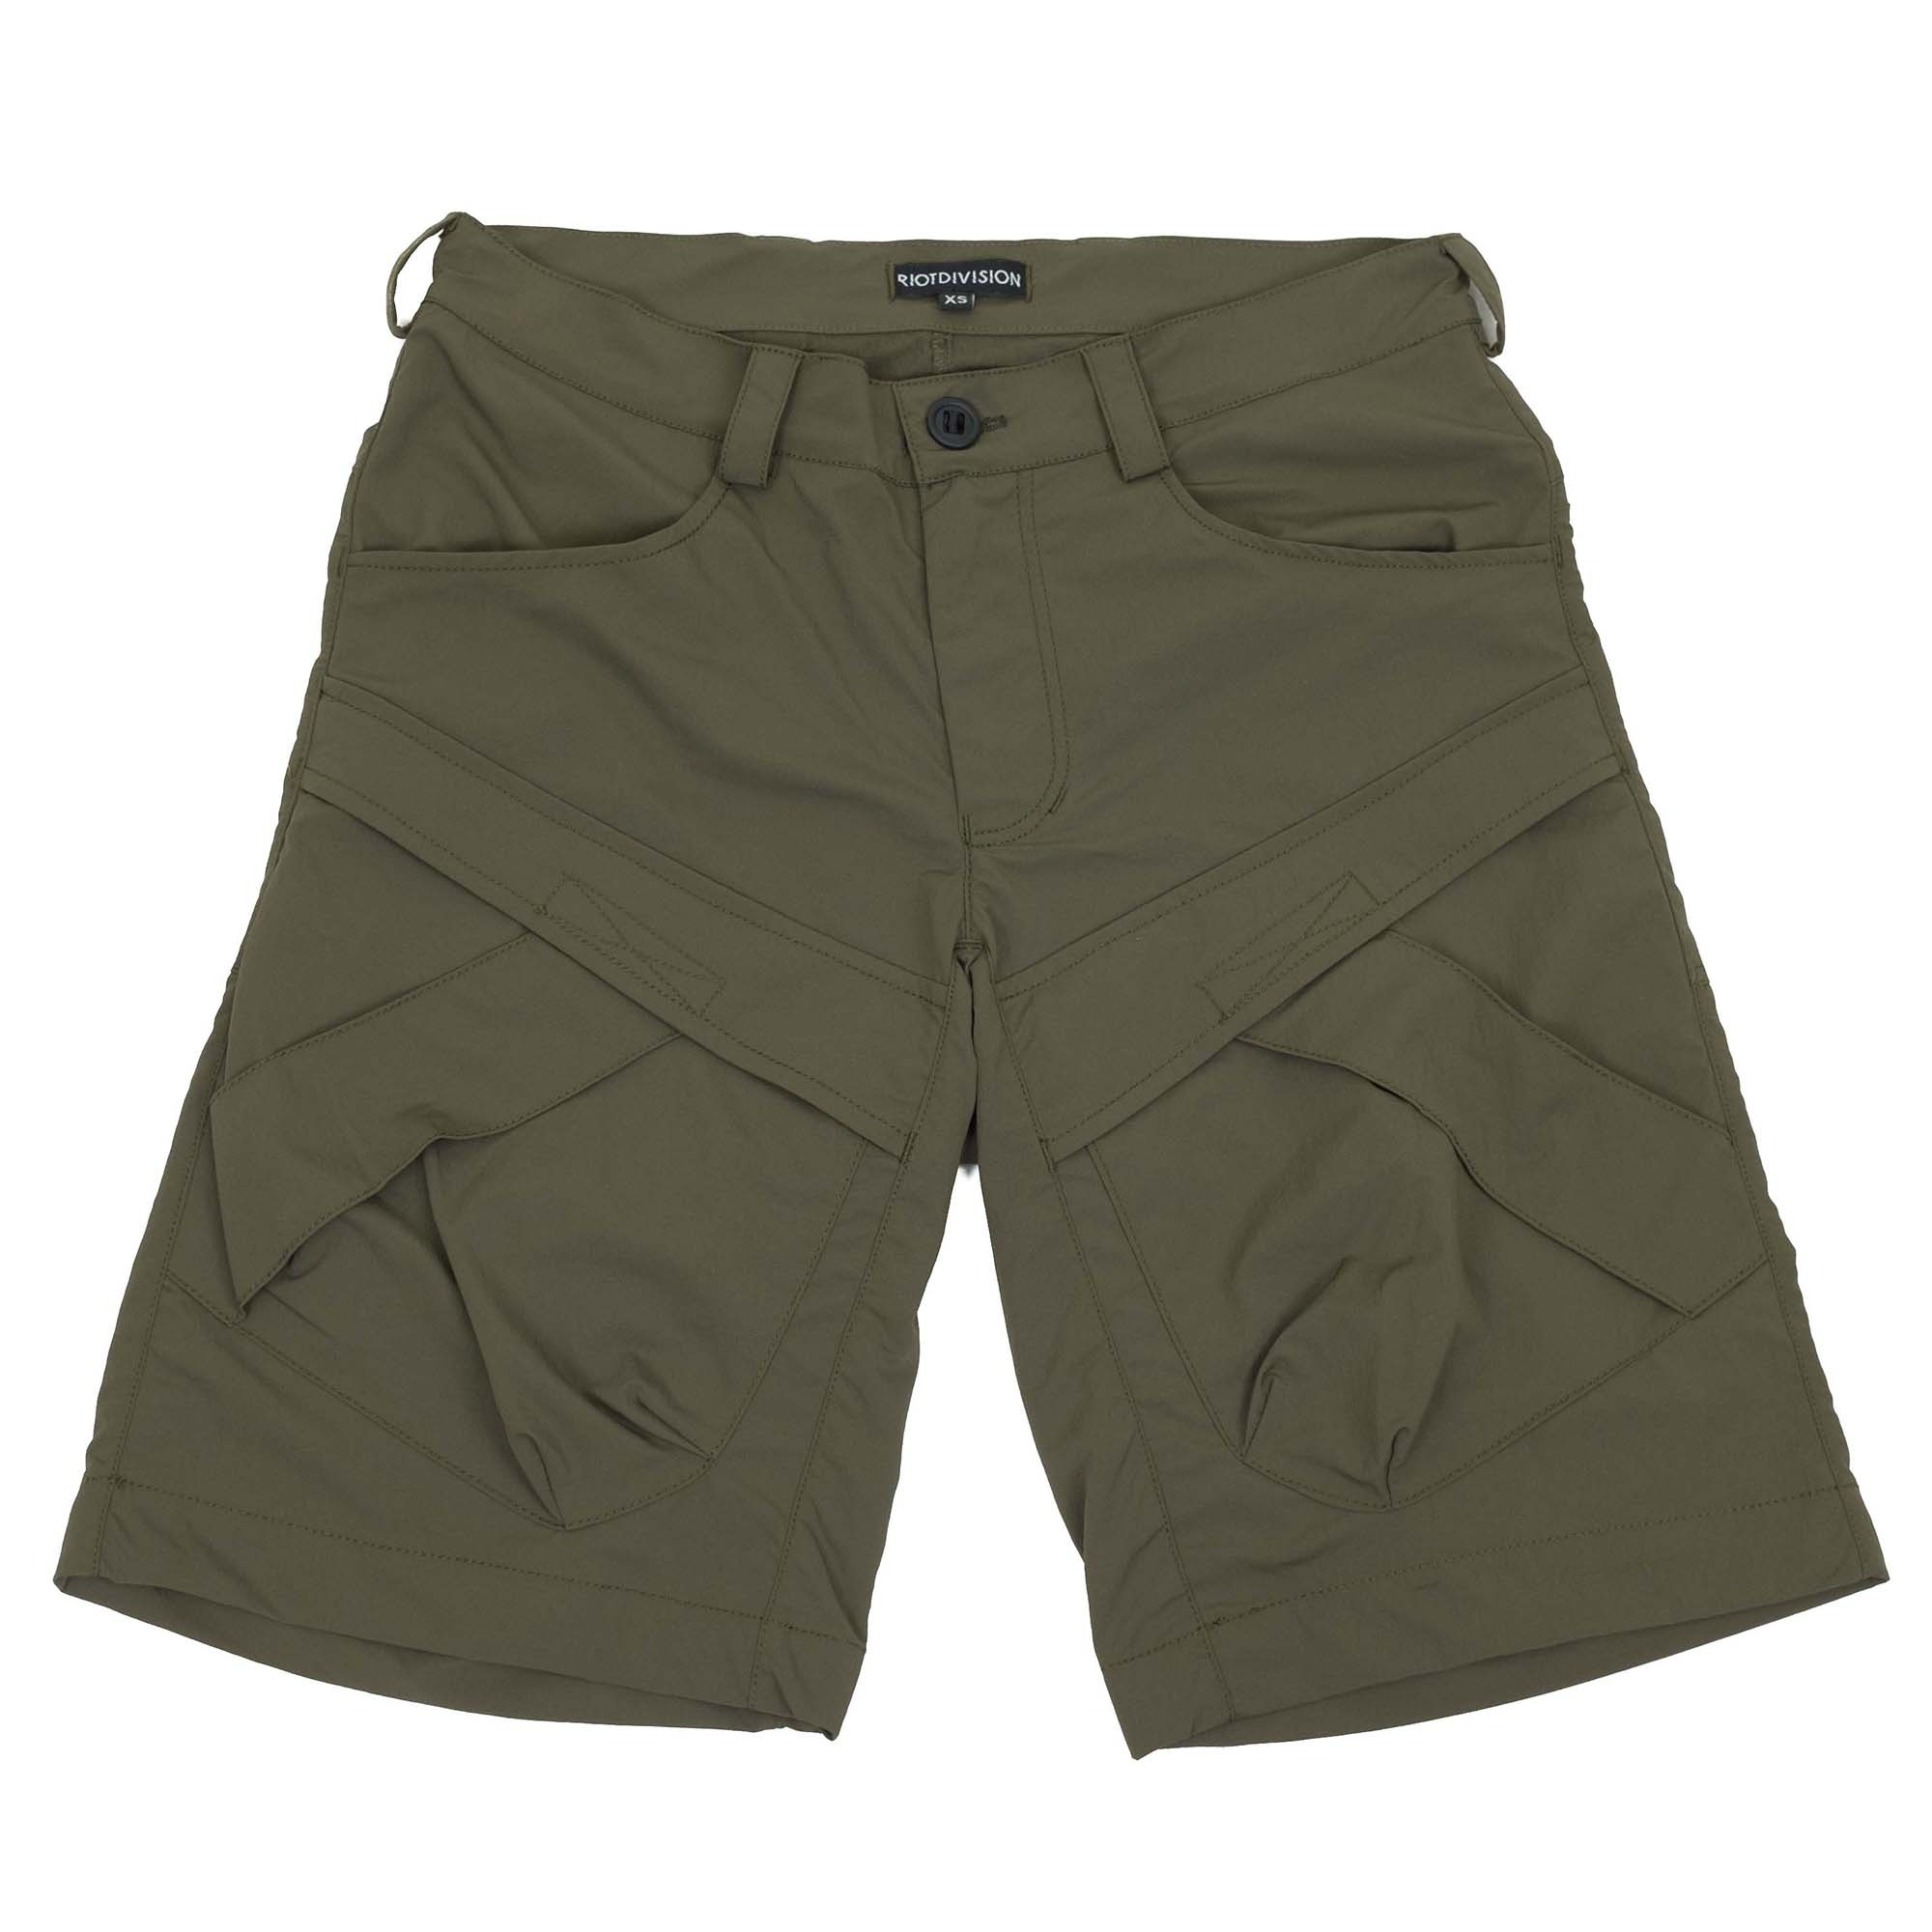 Riot Division Two Pockets Shorts Modified - Khaki